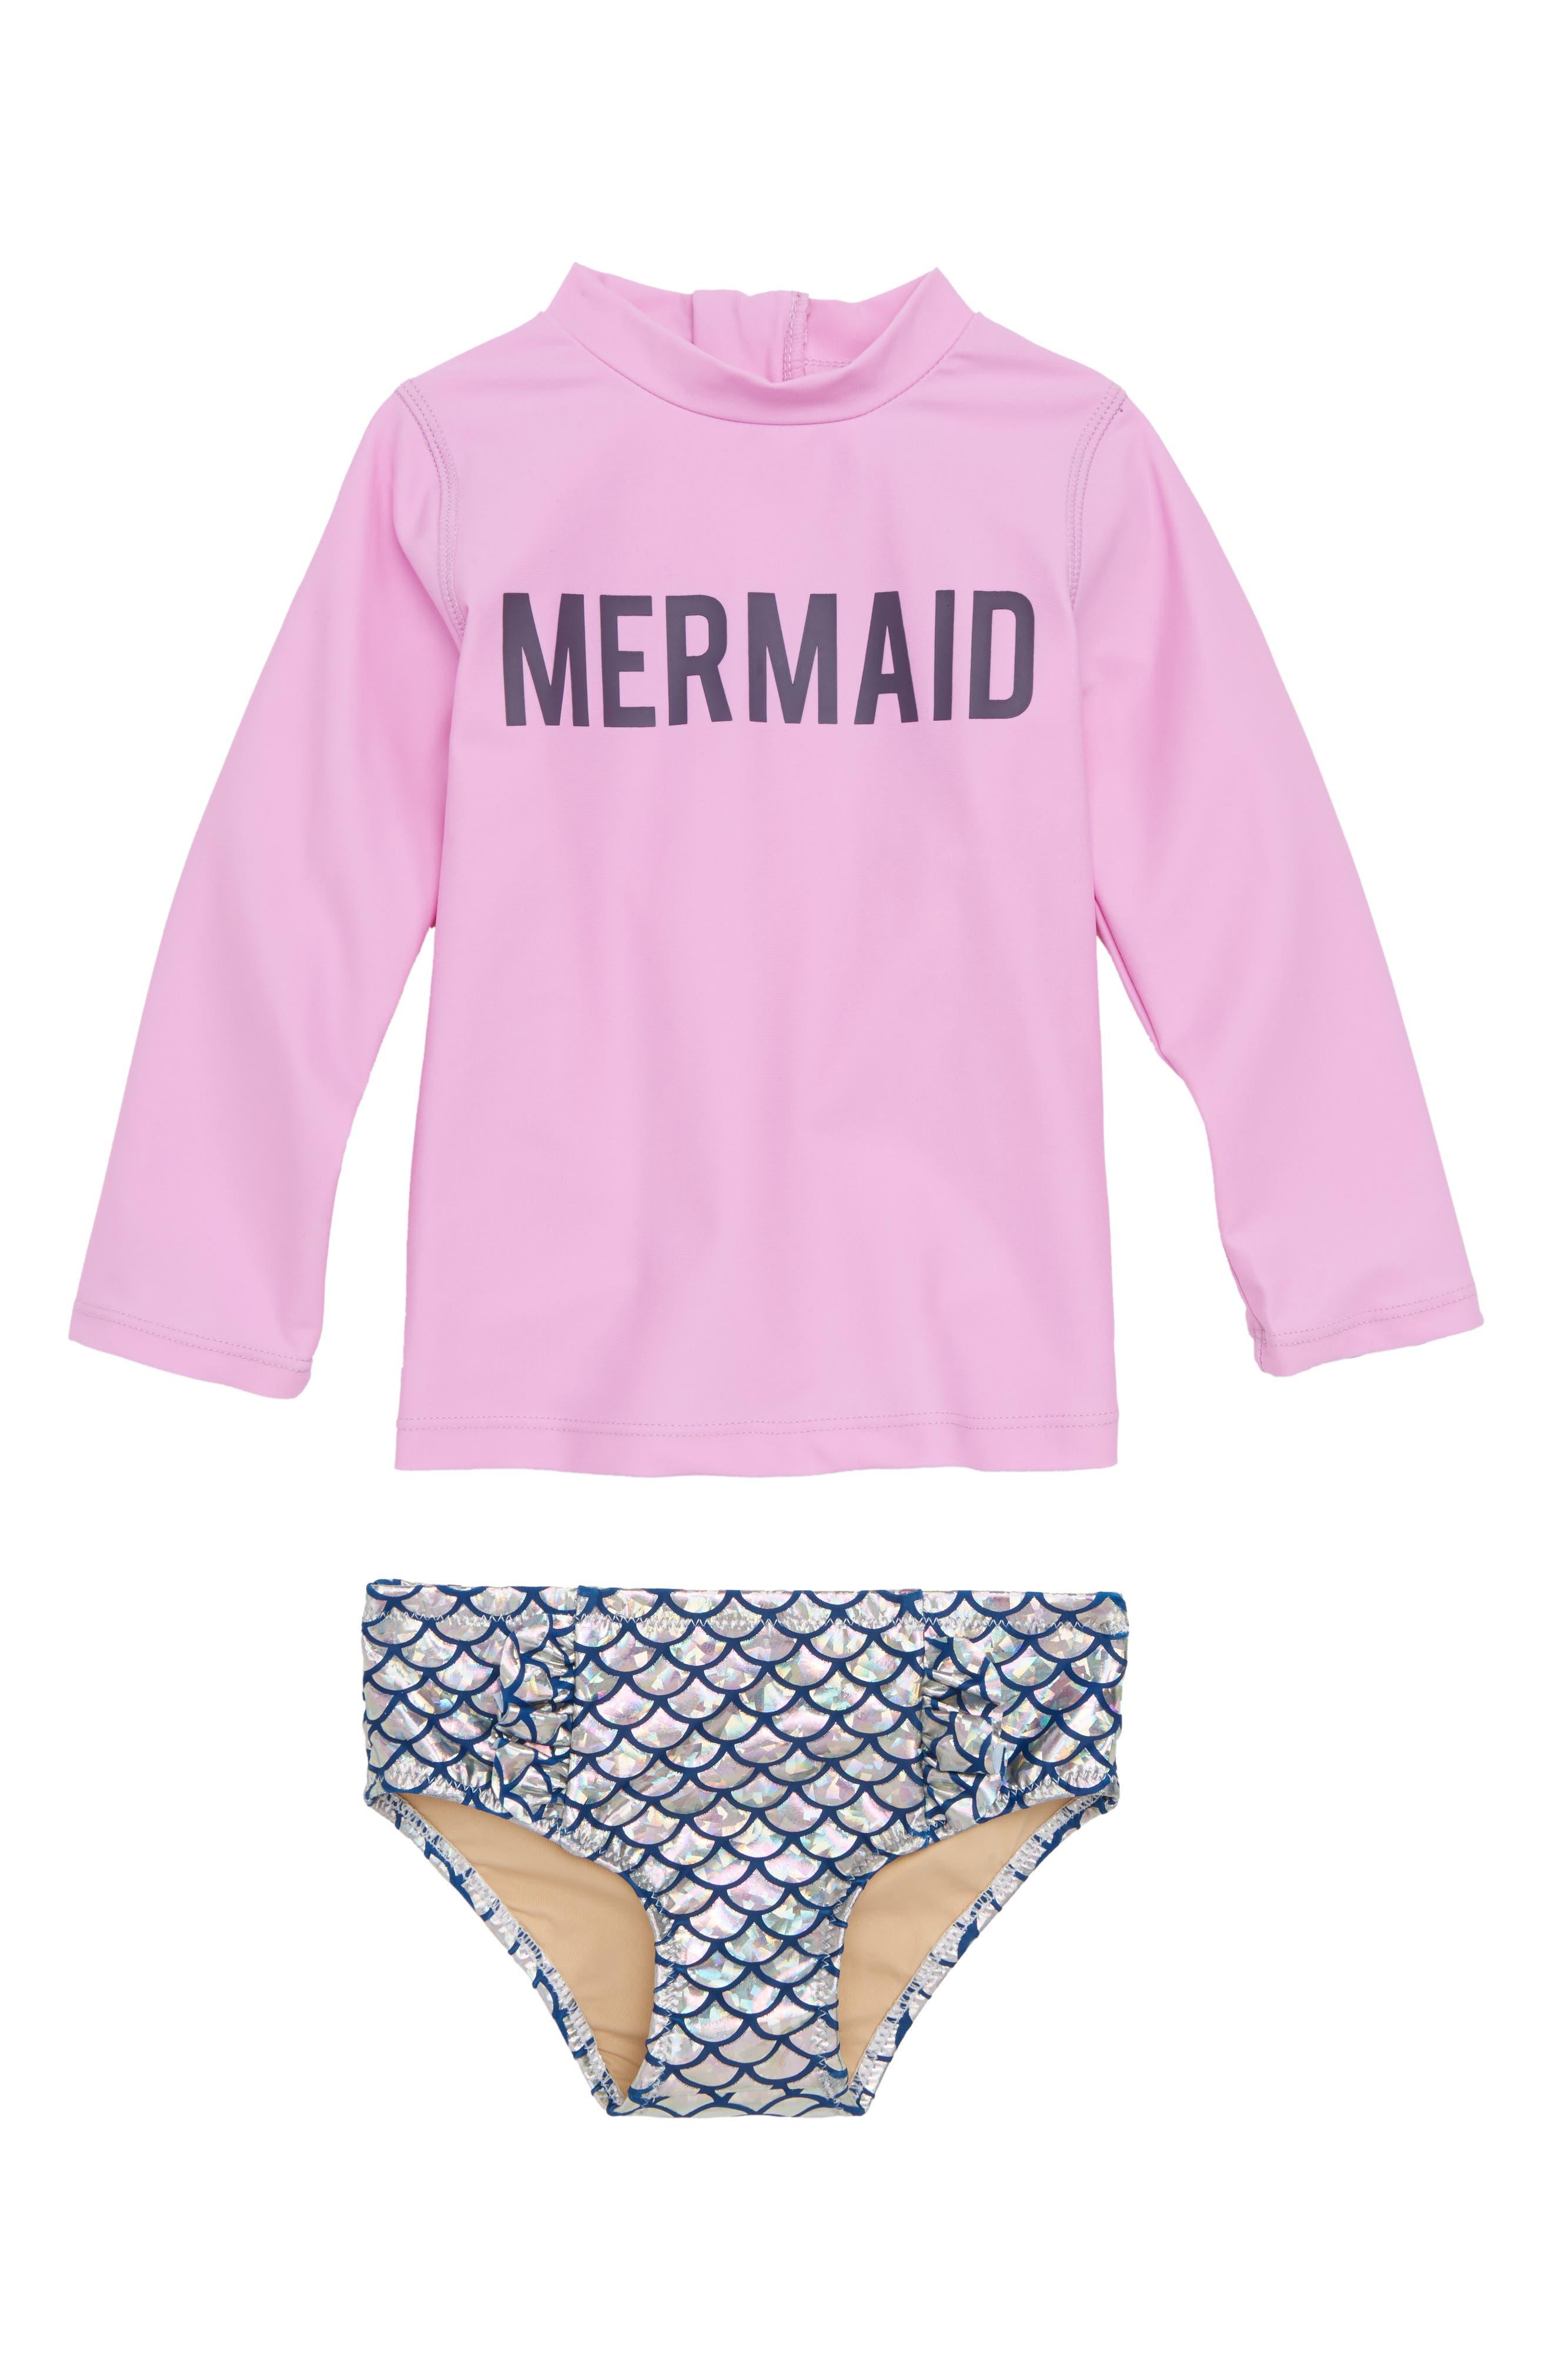 SHADE CRITTERS,                             Mermaid Magic Rashguard Two-Piece Swimsuit,                             Main thumbnail 1, color,                             500